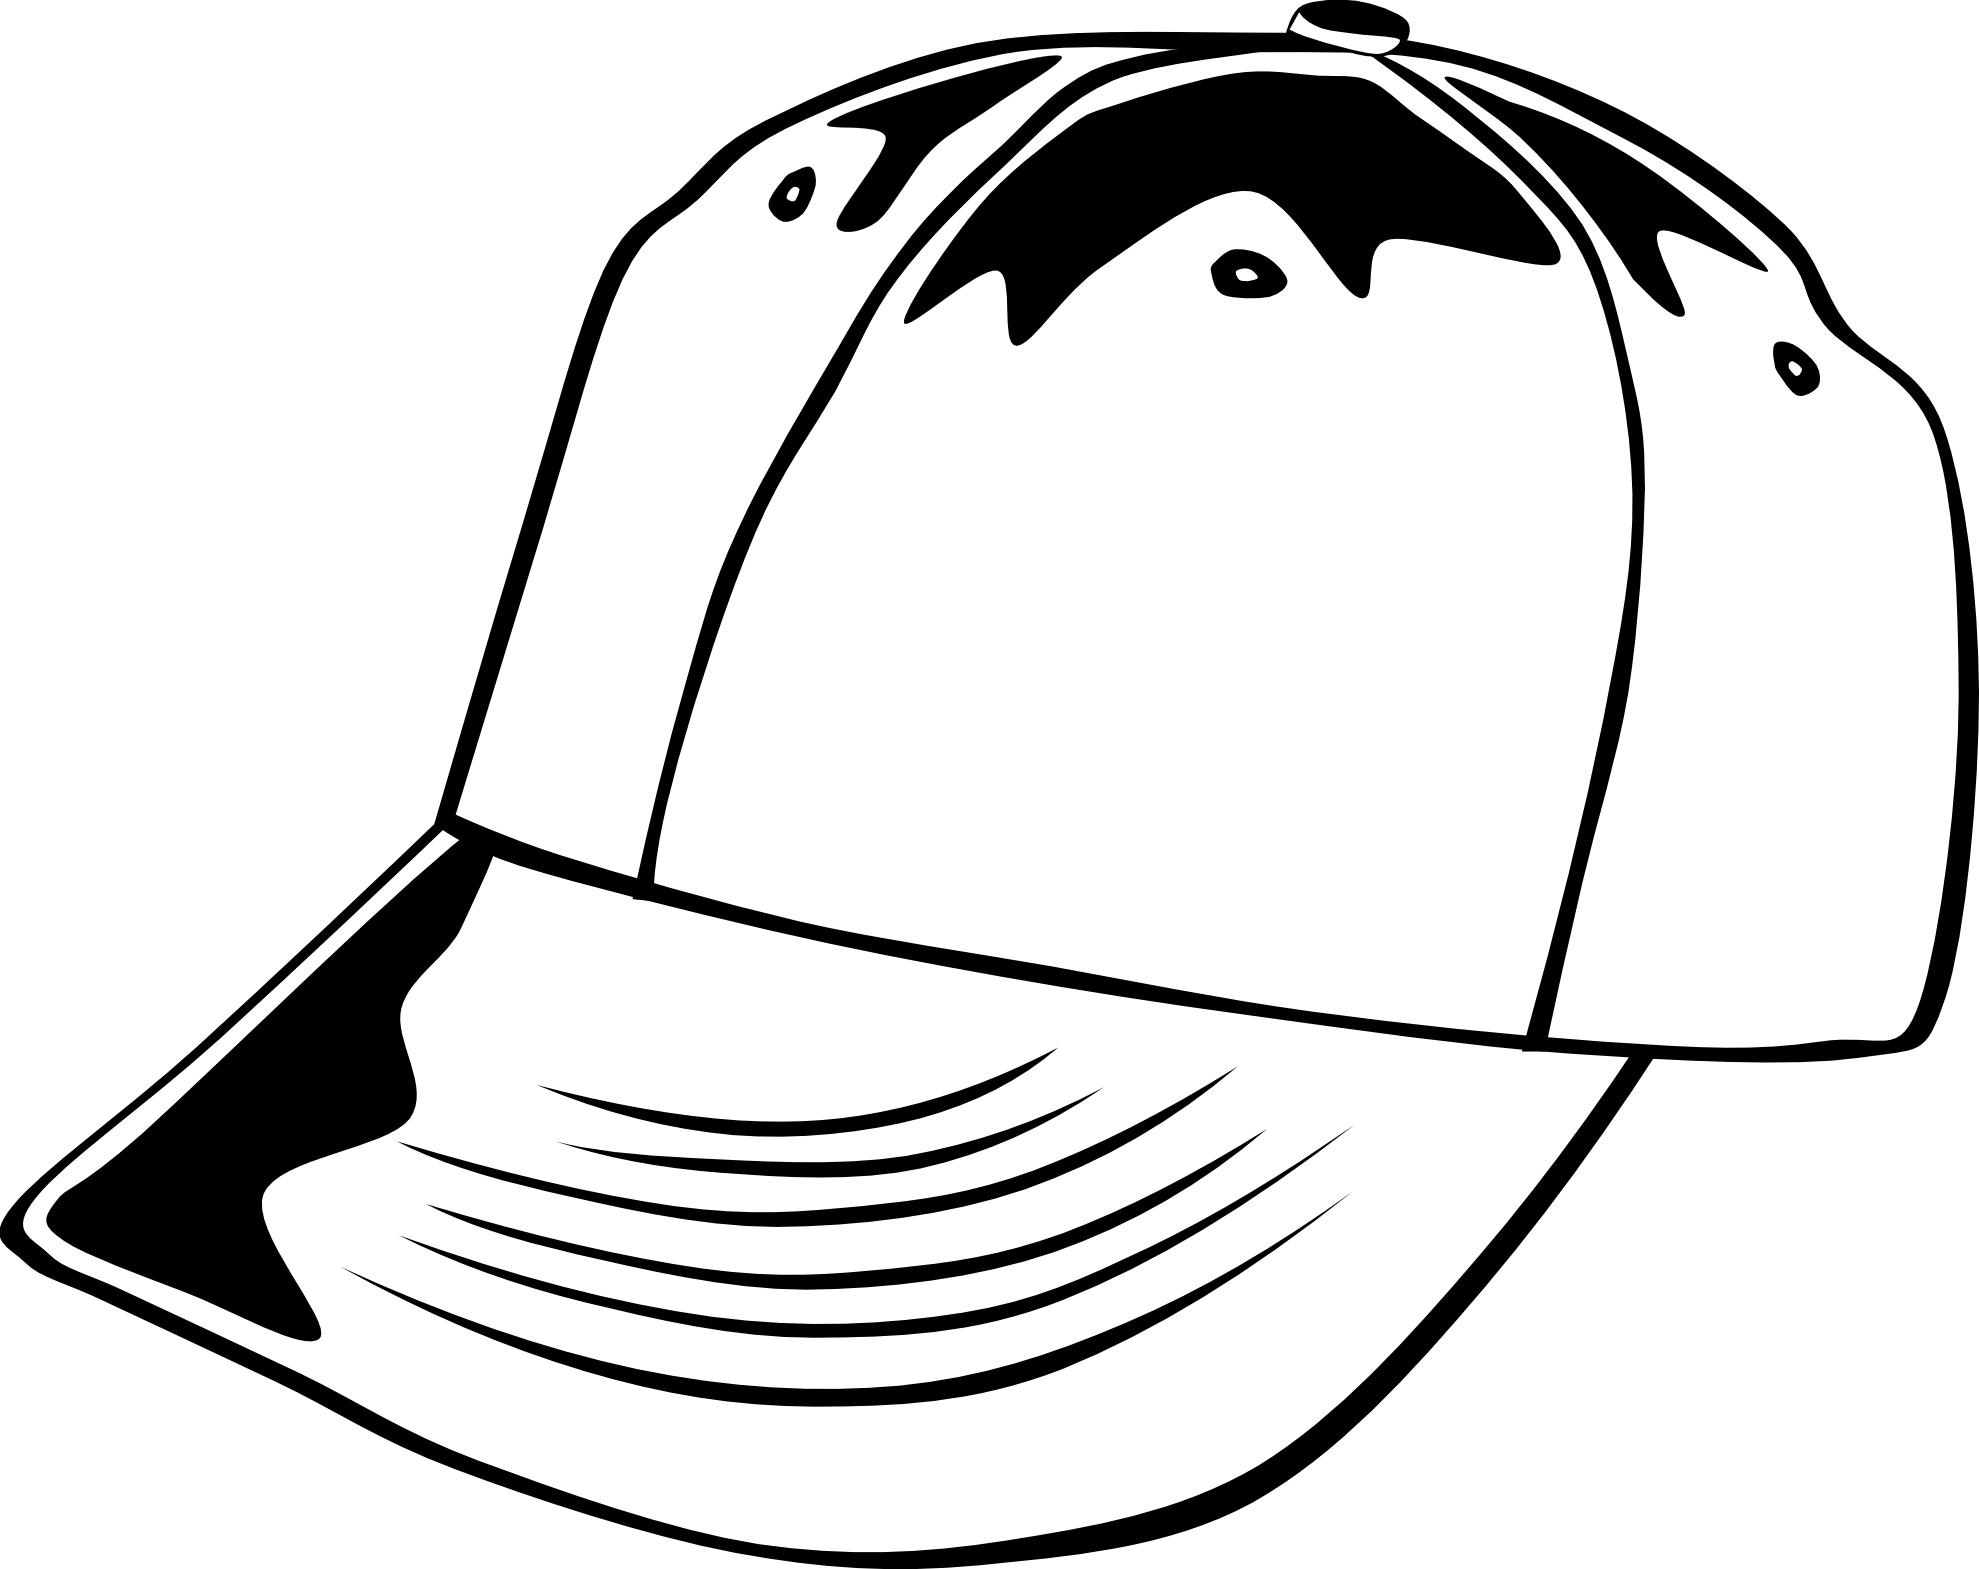 Net Clip Art Black And White Clipart Panda